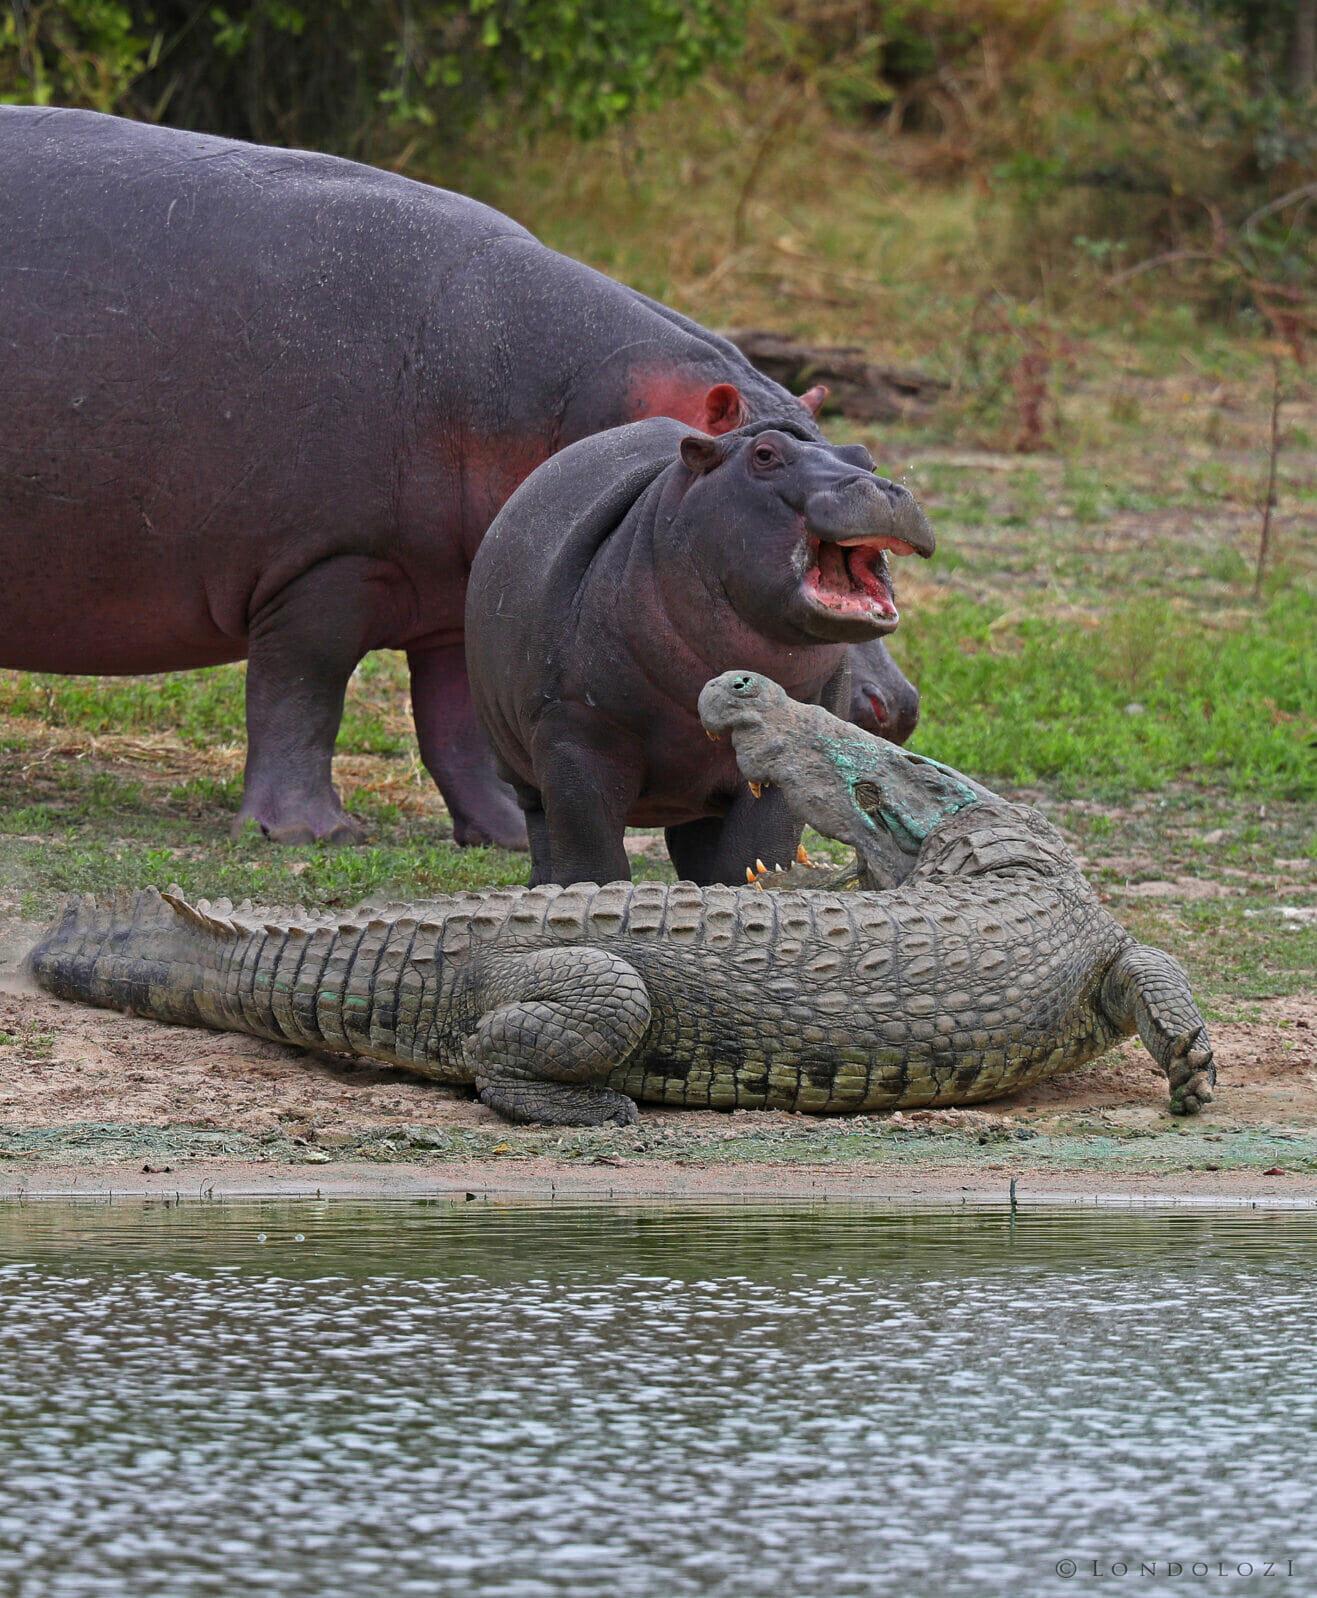 crocodile snapping at young hippo tony goldman